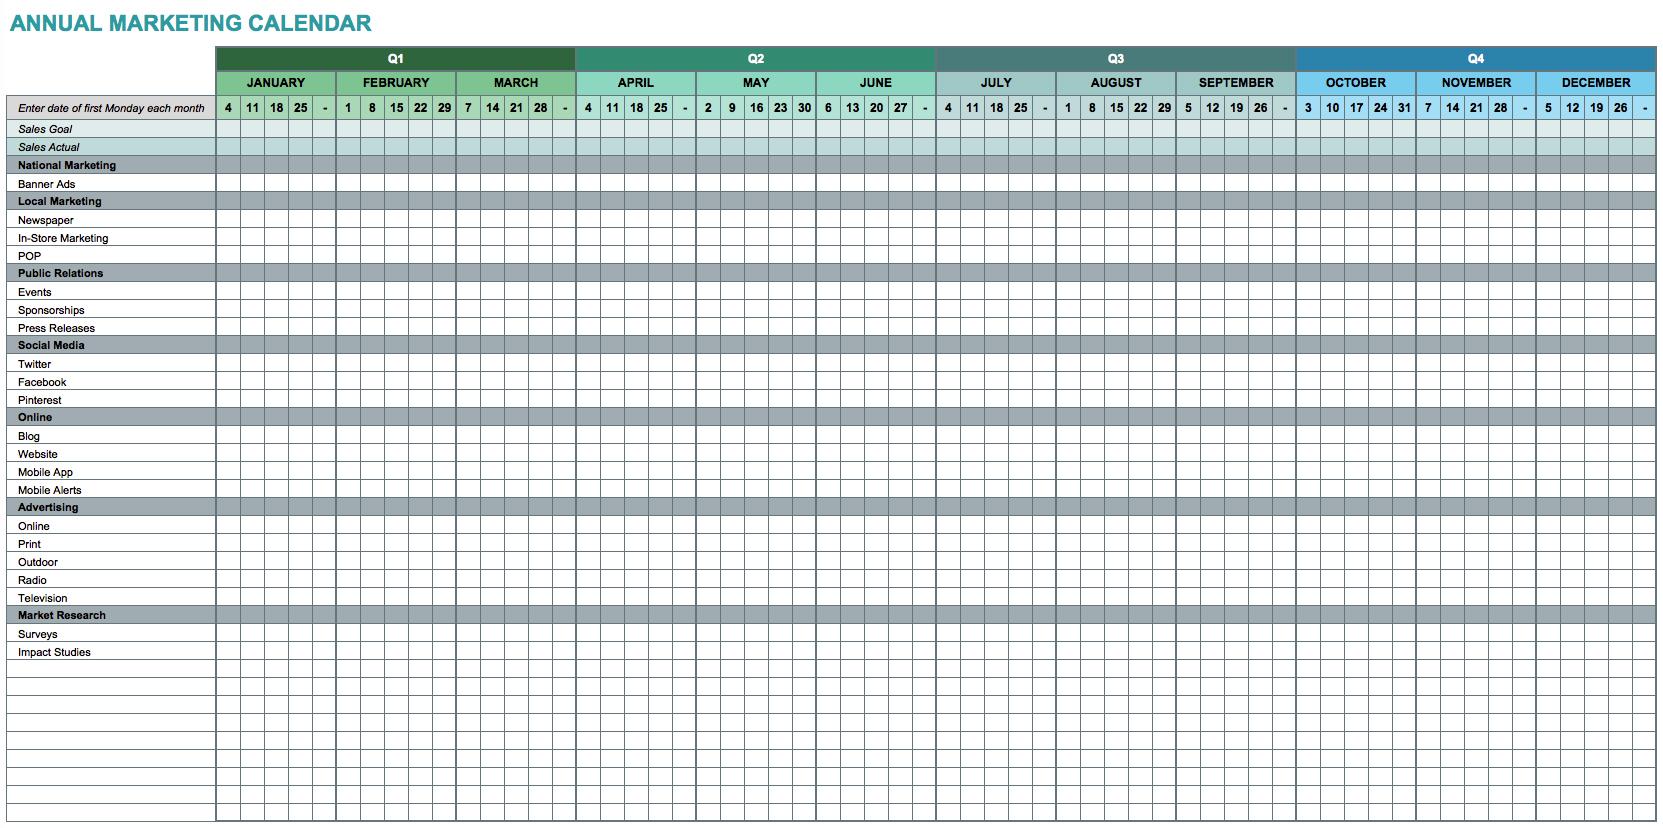 9 Free Marketing Calendar Templates For Excel - Smartsheet Within Calendar Spreadsheet